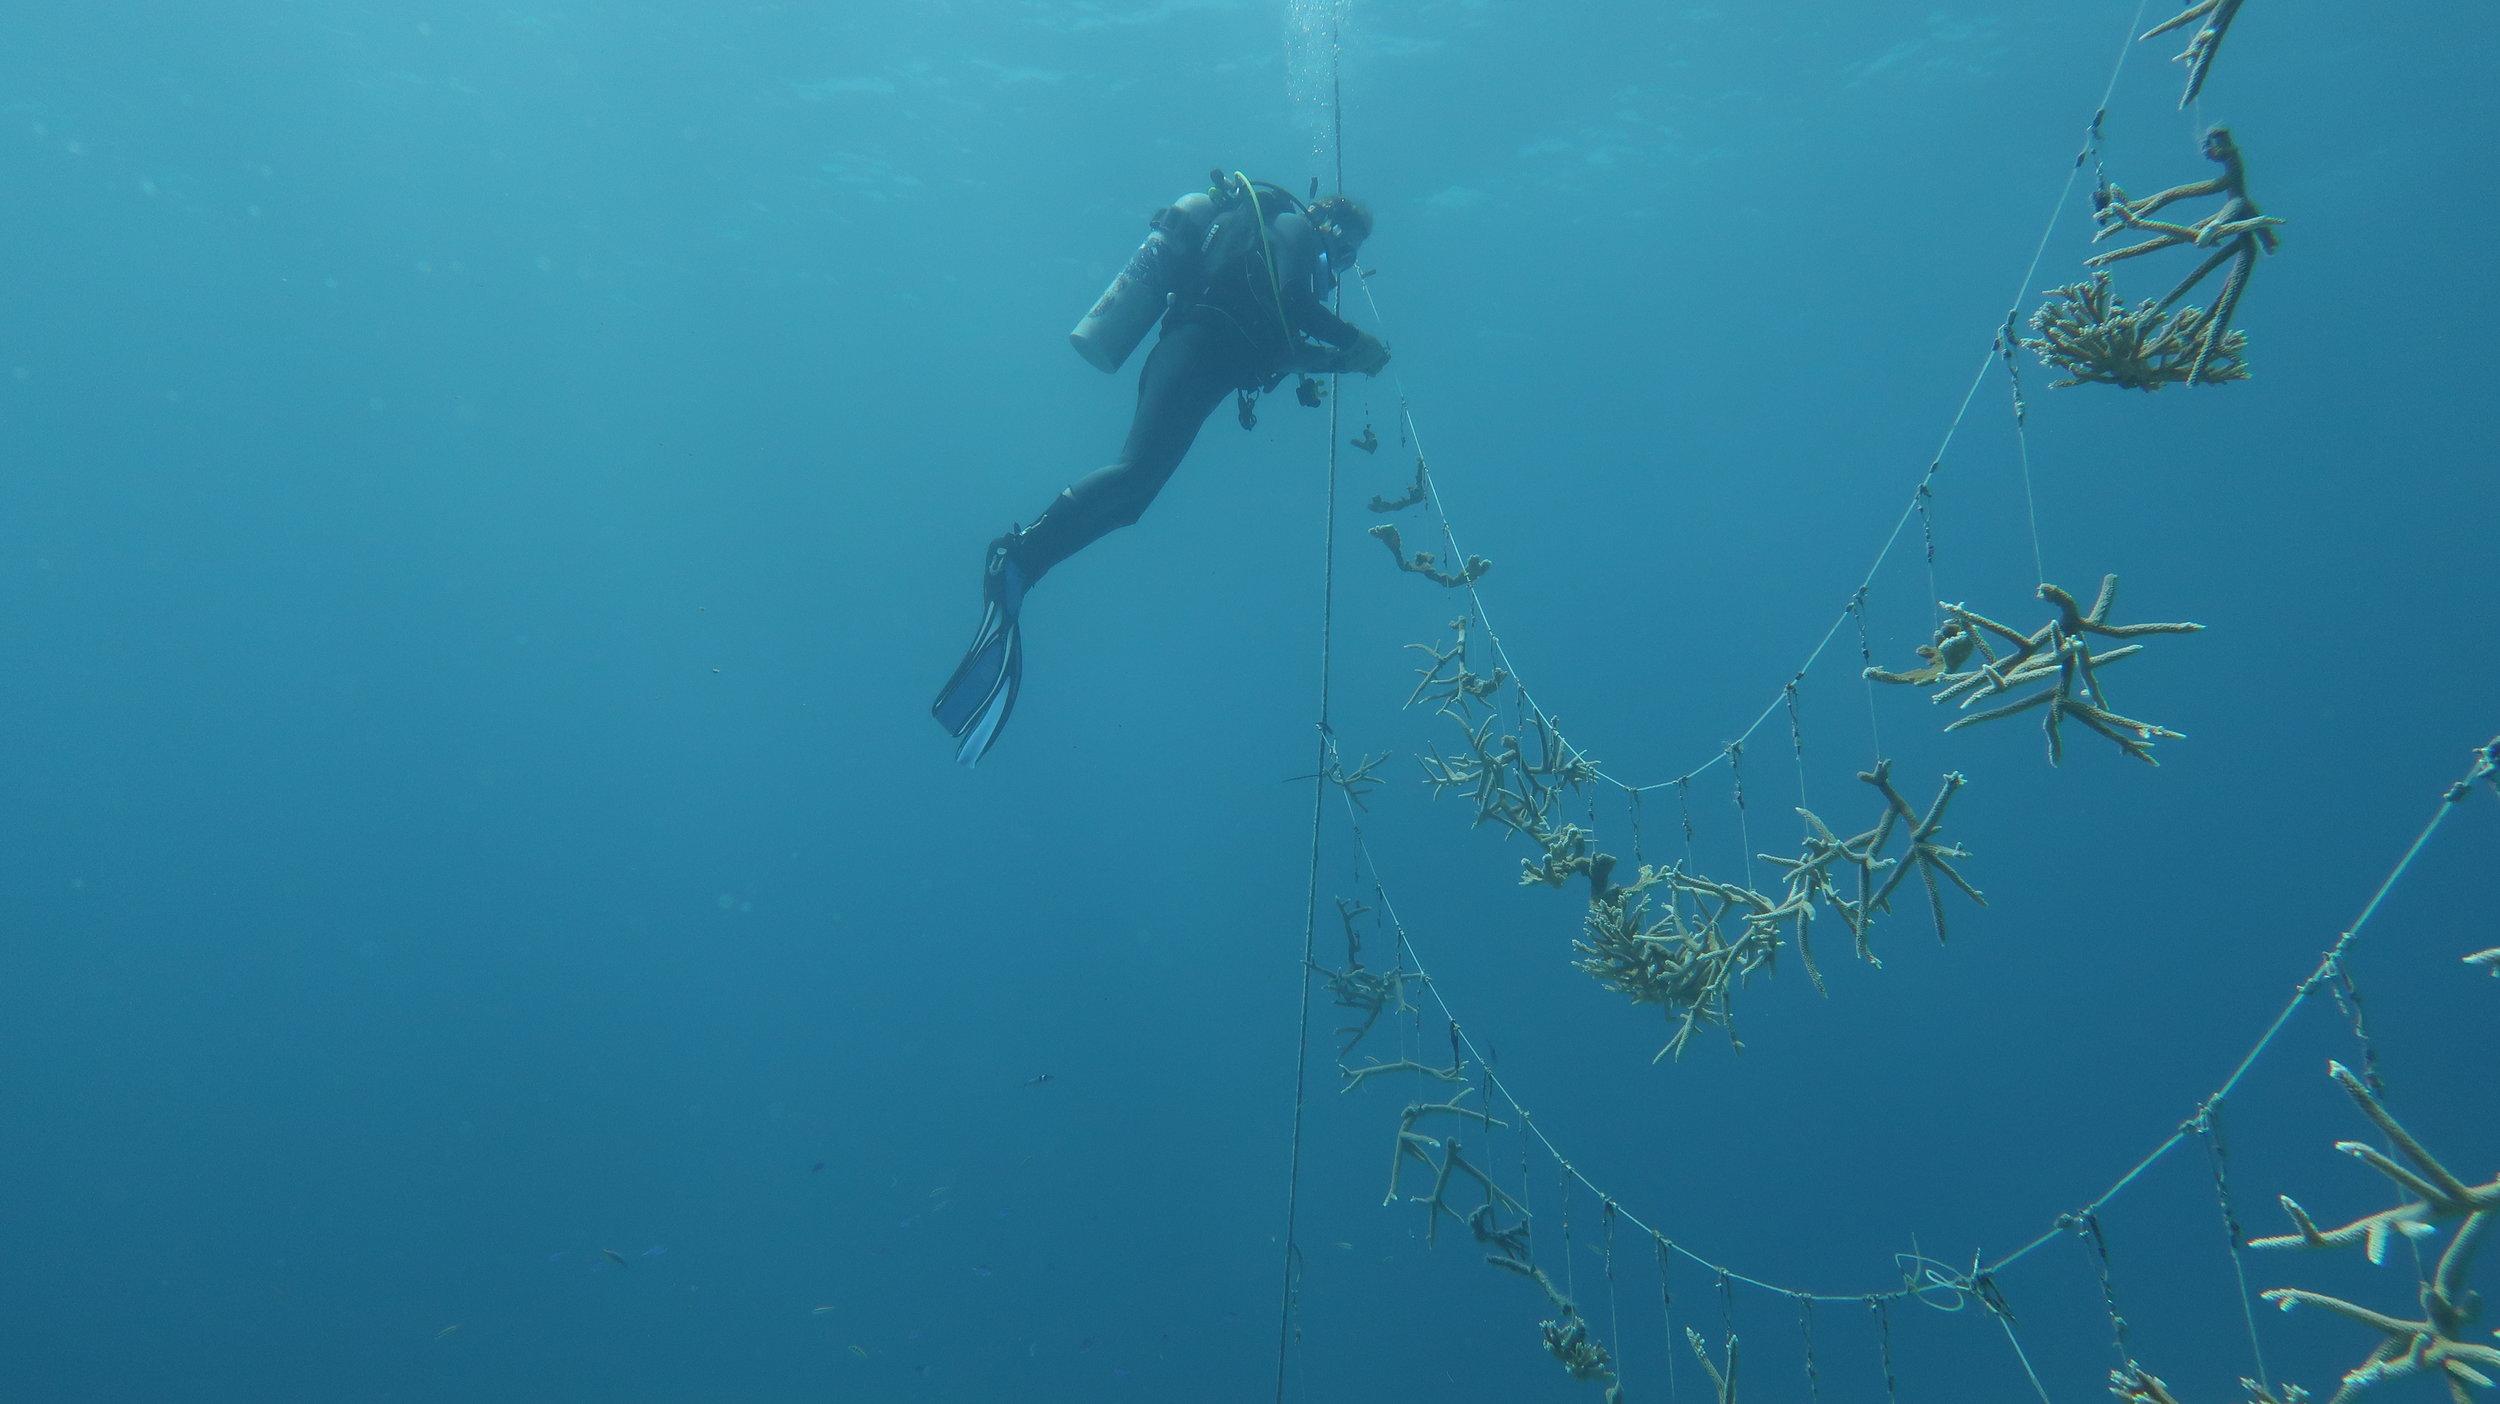 coral_nursery_forfar_bahamas.jpg